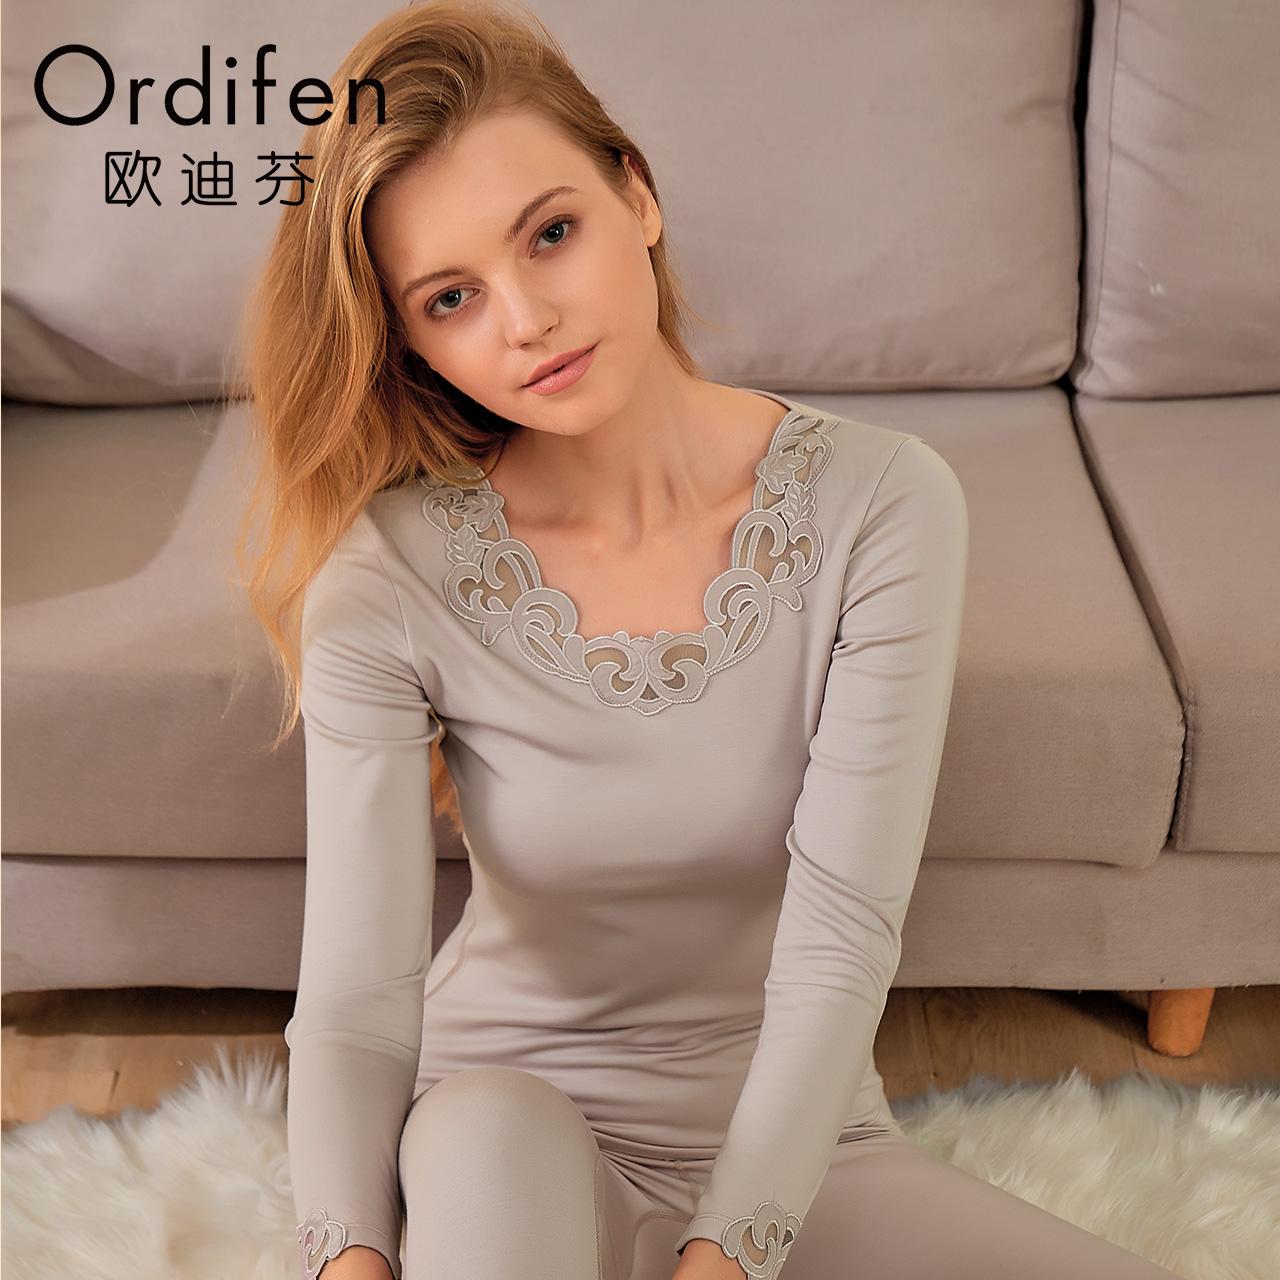 Ordifen 欧迪芬 保暖内衣套装 天猫优惠券折后¥59包邮(¥199-140)男、女多款多色可选